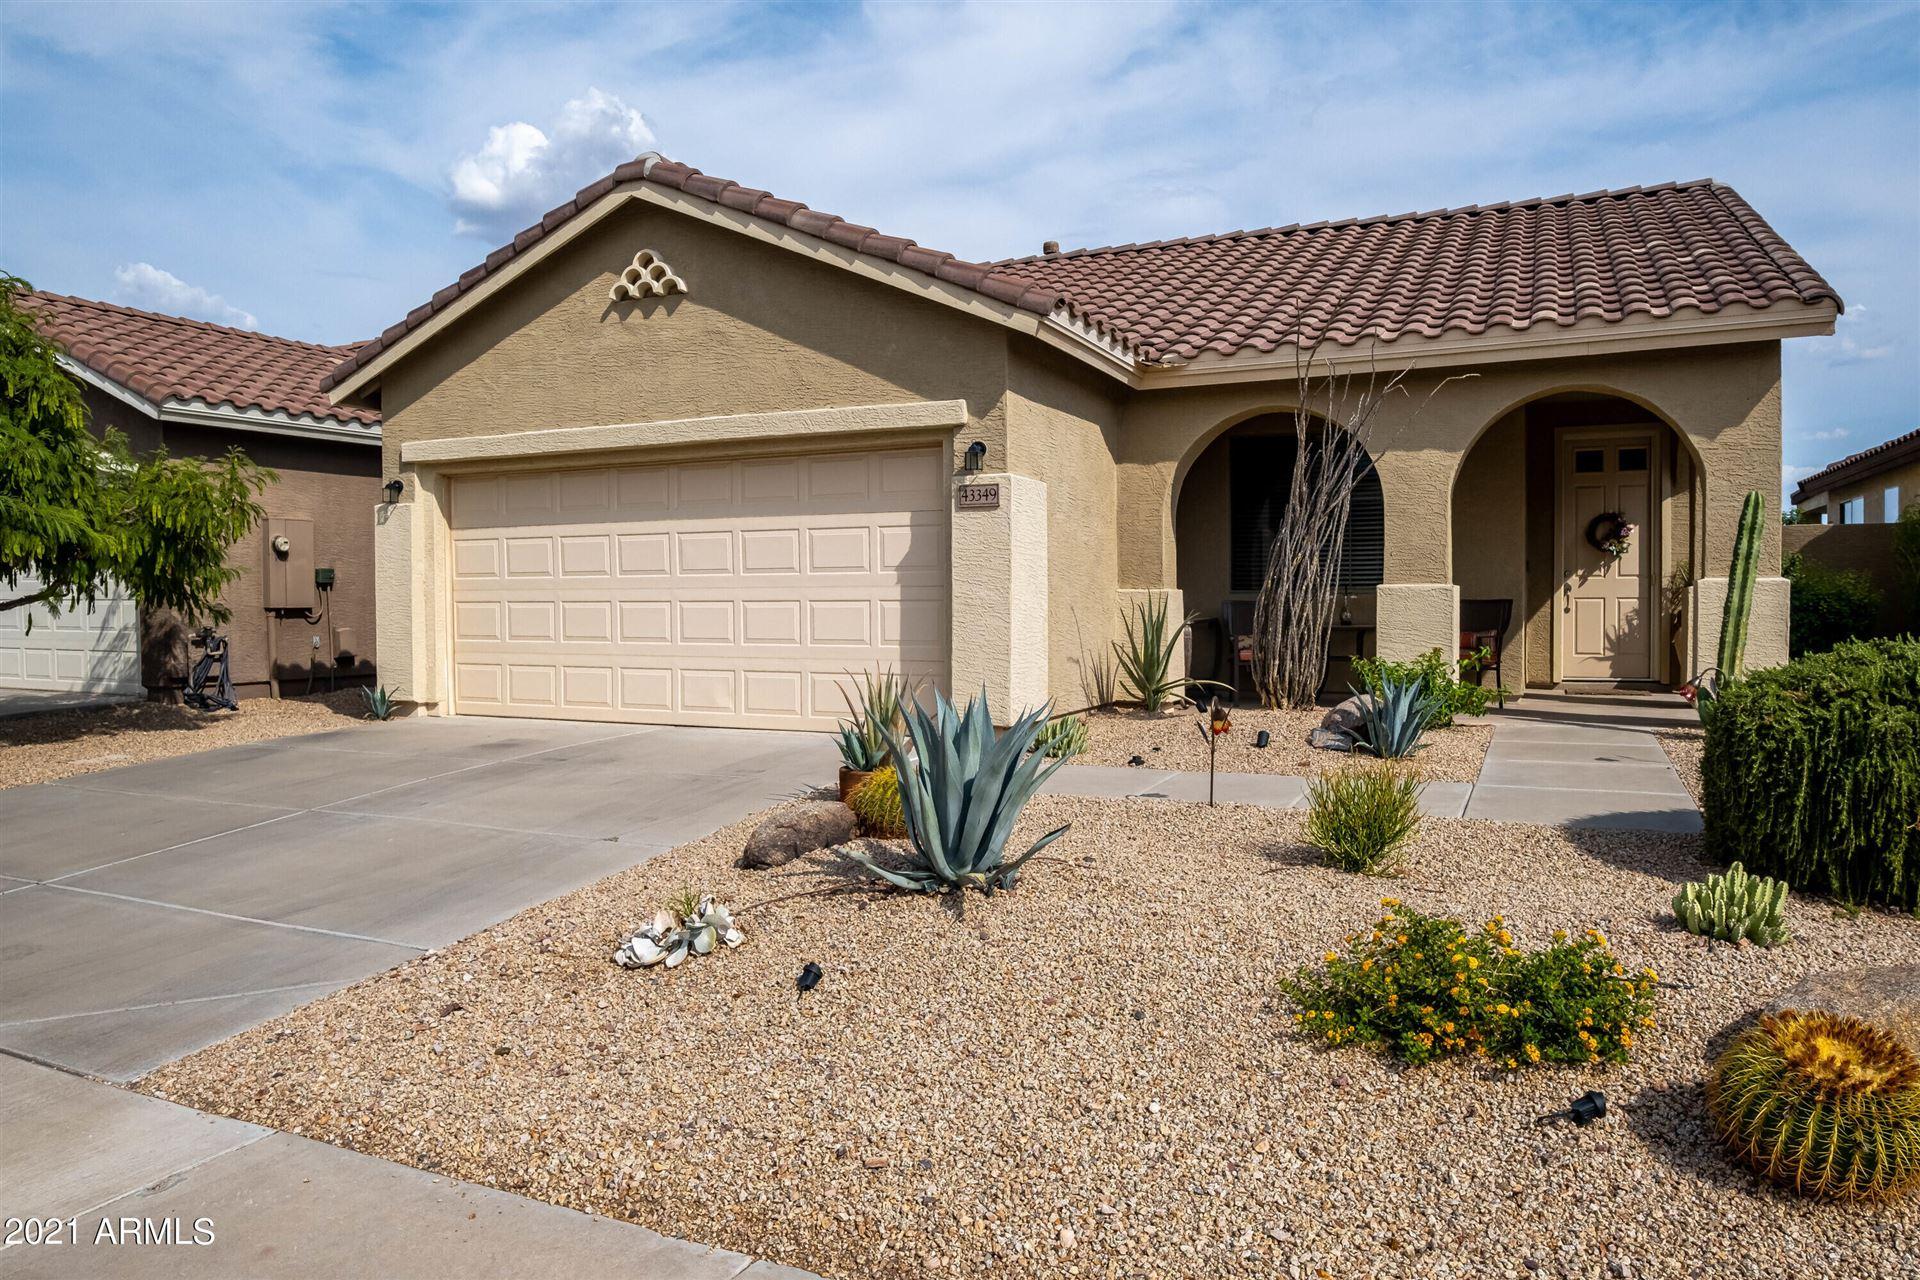 Photo of 43349 N VISTA HILLS Drive, Anthem, AZ 85086 (MLS # 6267552)